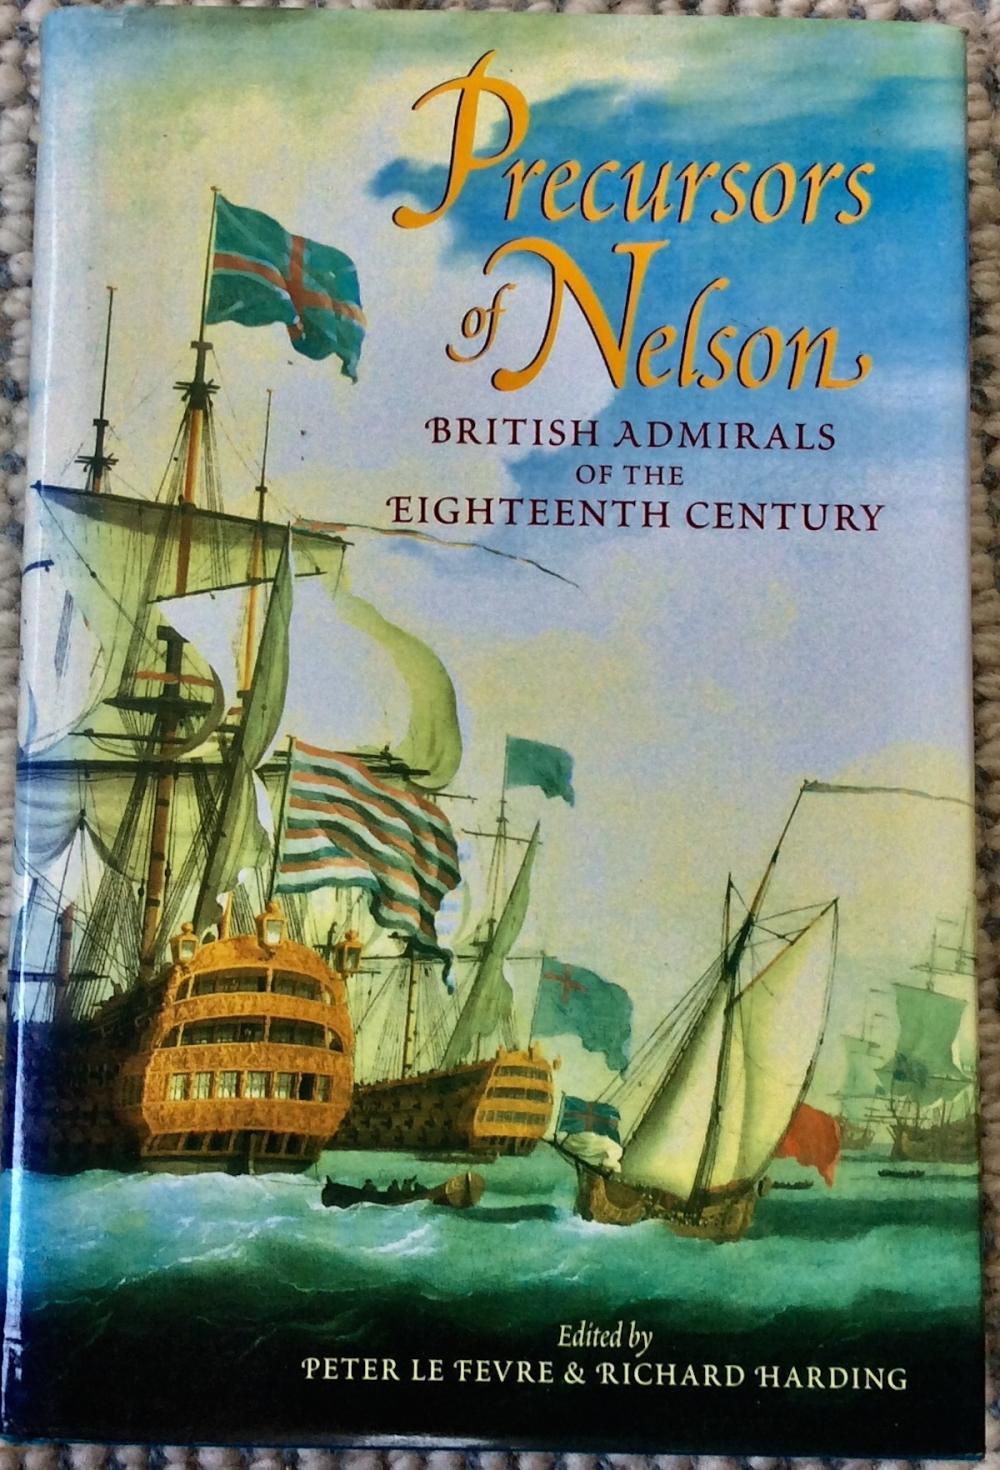 Antique/Collectible Books/Art: Military/History/Technical books etc Original Art Autographs Epherma